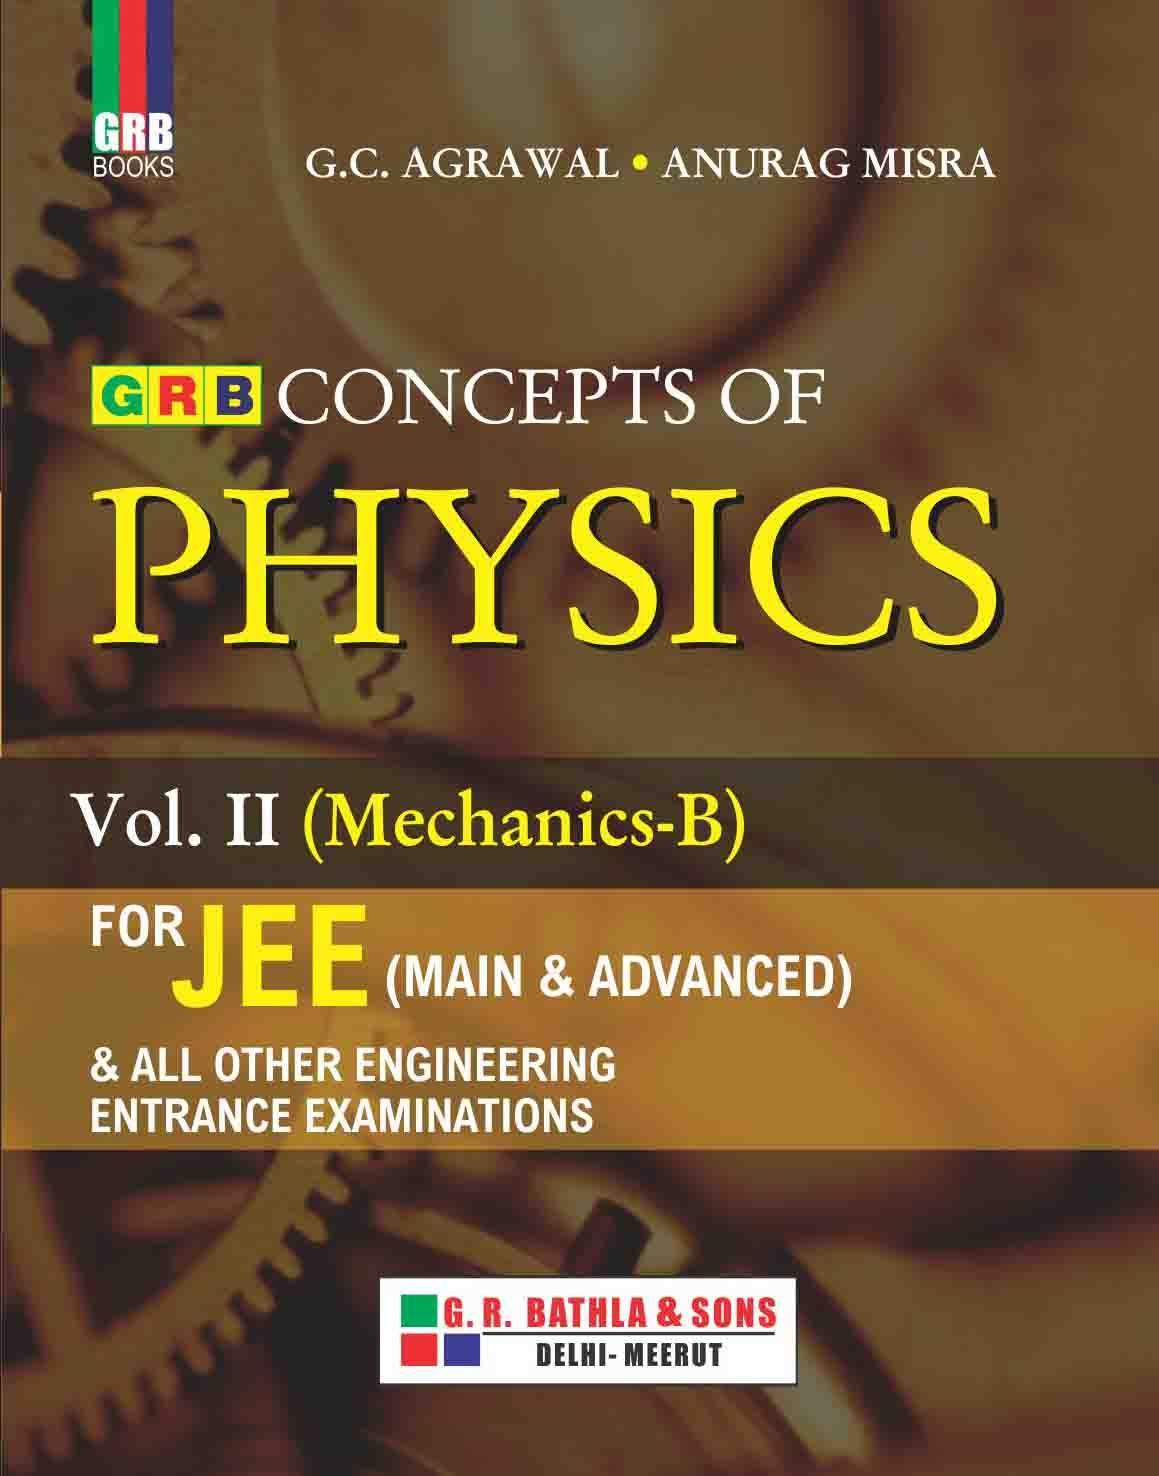 Concept of physics vol 2 mechanicsb physics mechanic